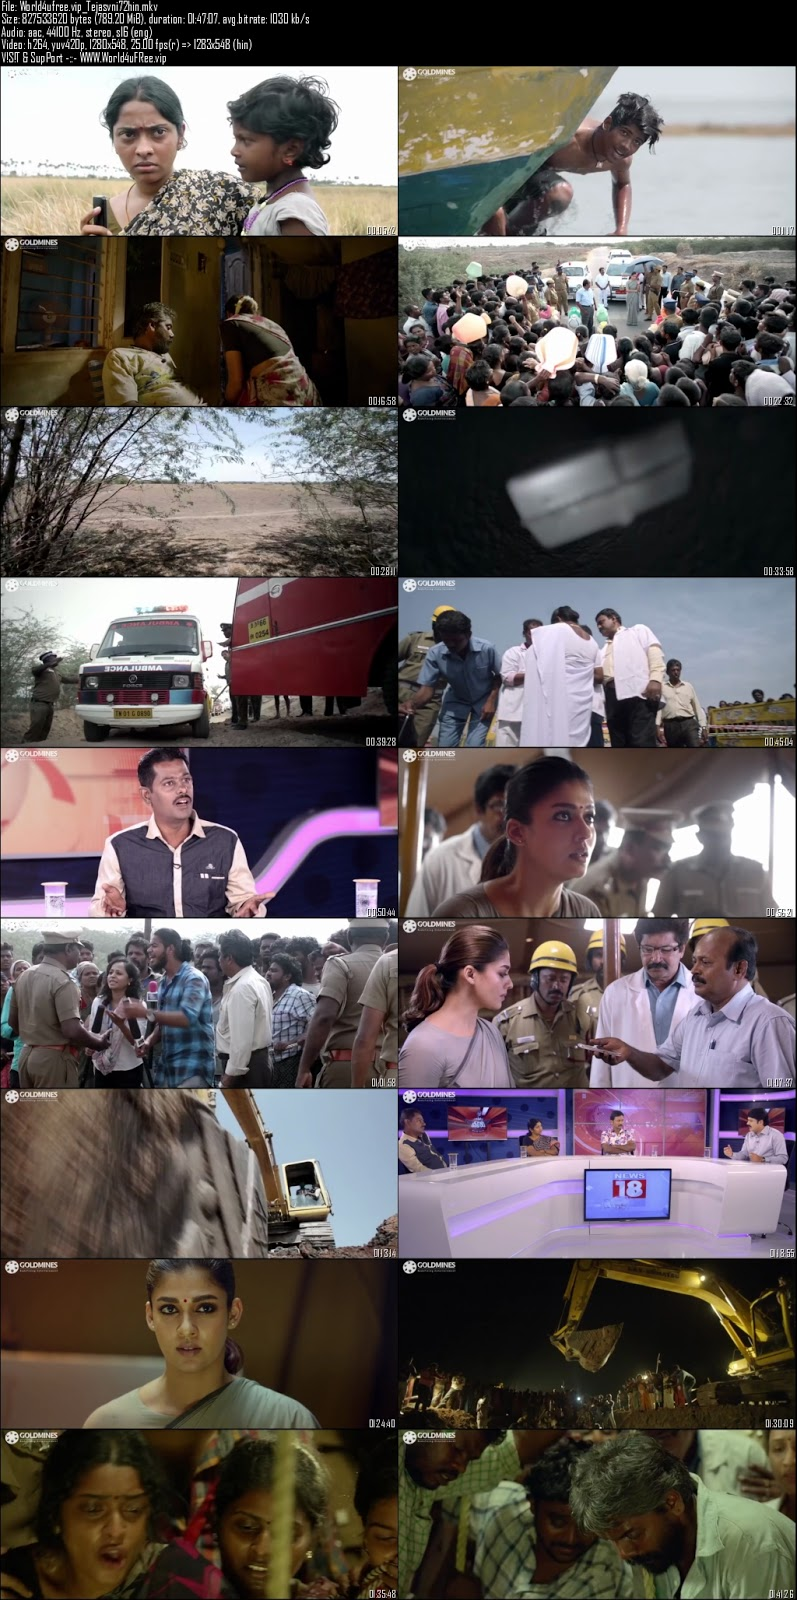 Tejasvini 2018 Hindi Dubbed 720p WEBRip 800Mb x264 world4ufree.fun , South indian movie Tejasvini 2018 hindi dubbed world4ufree.fun 720p hdrip webrip dvdrip 700mb brrip bluray free download or watch online at world4ufree.fun